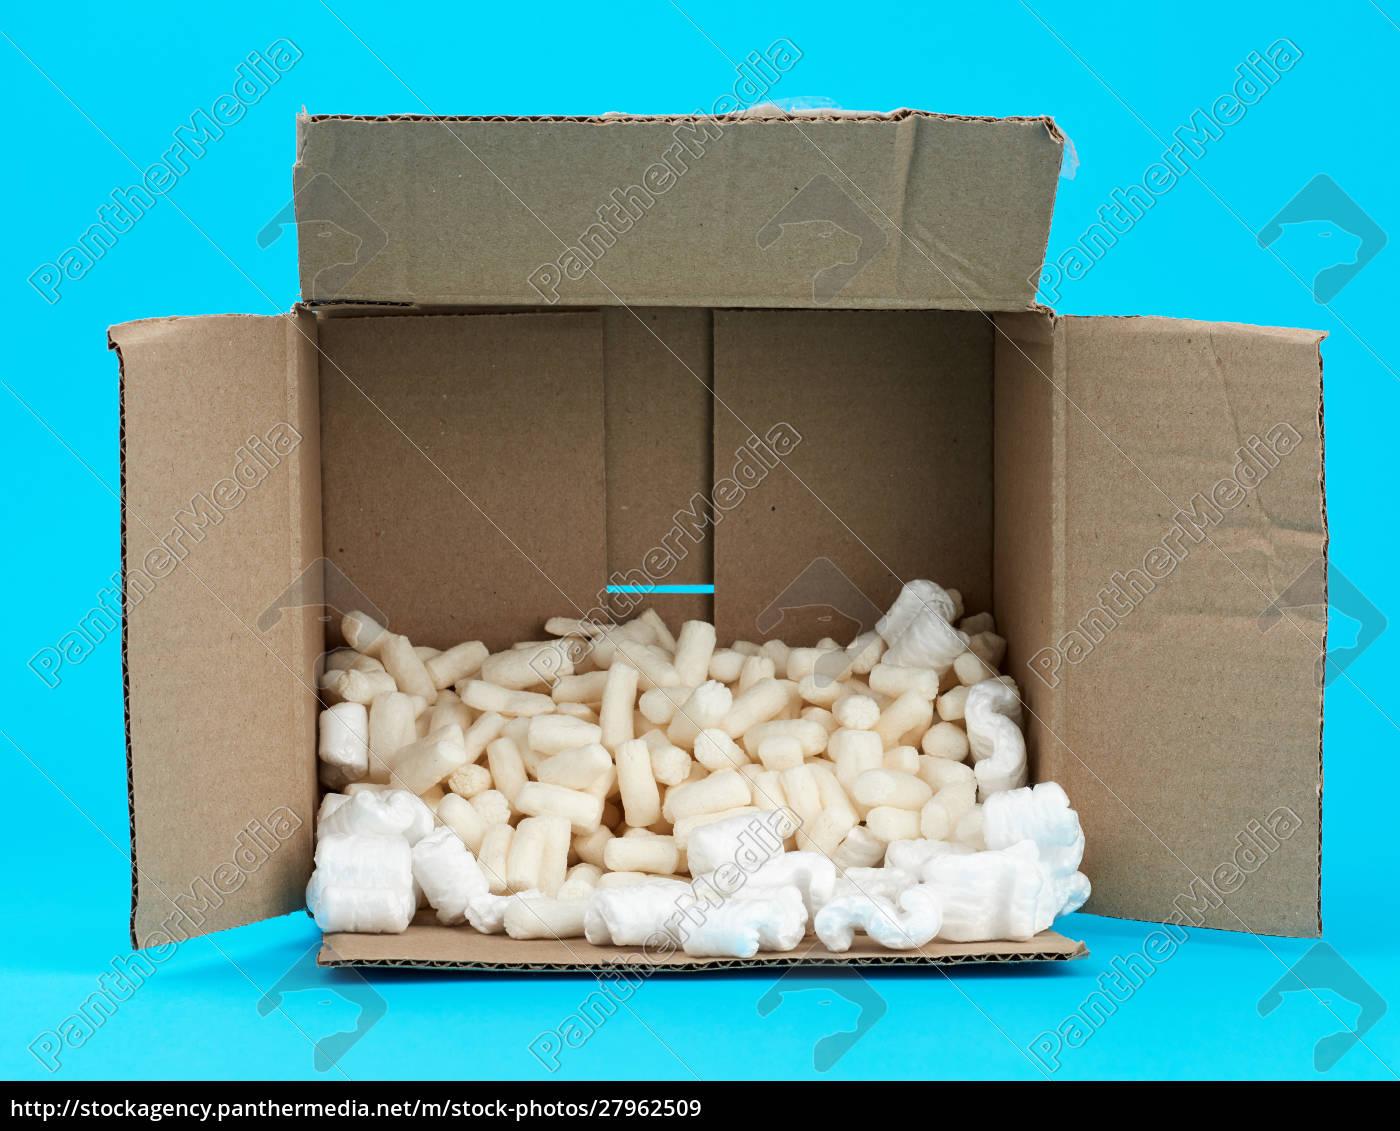 open, rectangular, brown, cardboard, box, with - 27962509